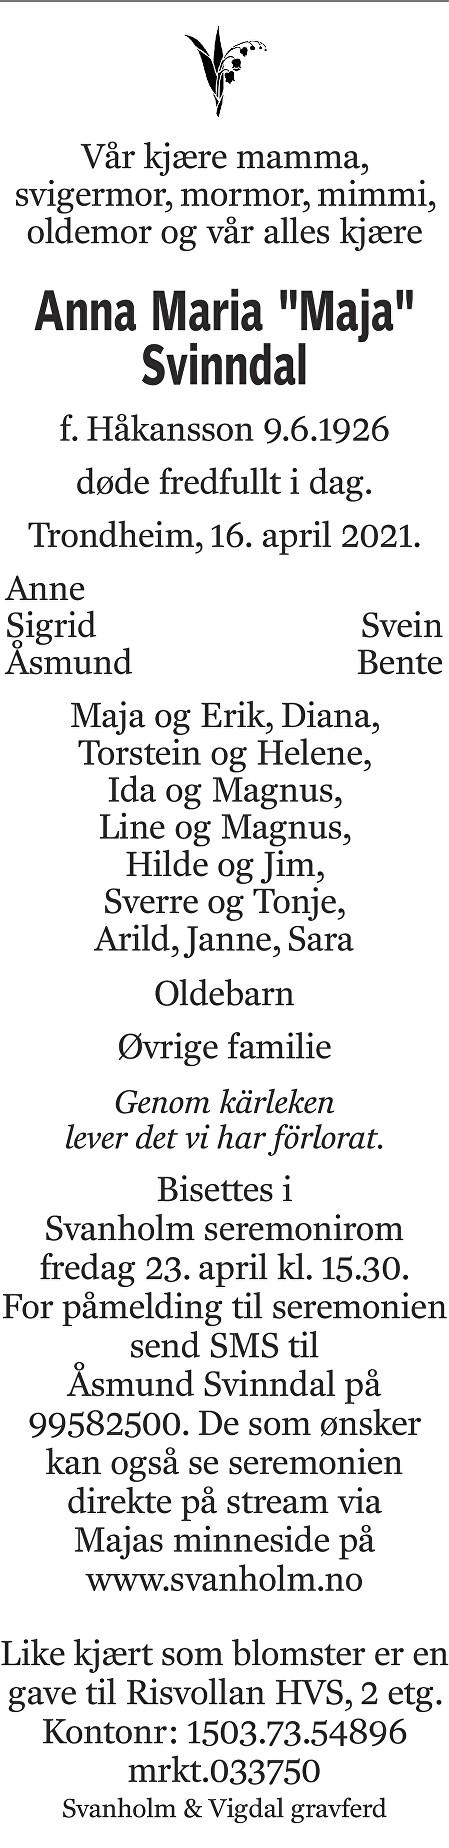 Anna Maria Svinndal Dødsannonse